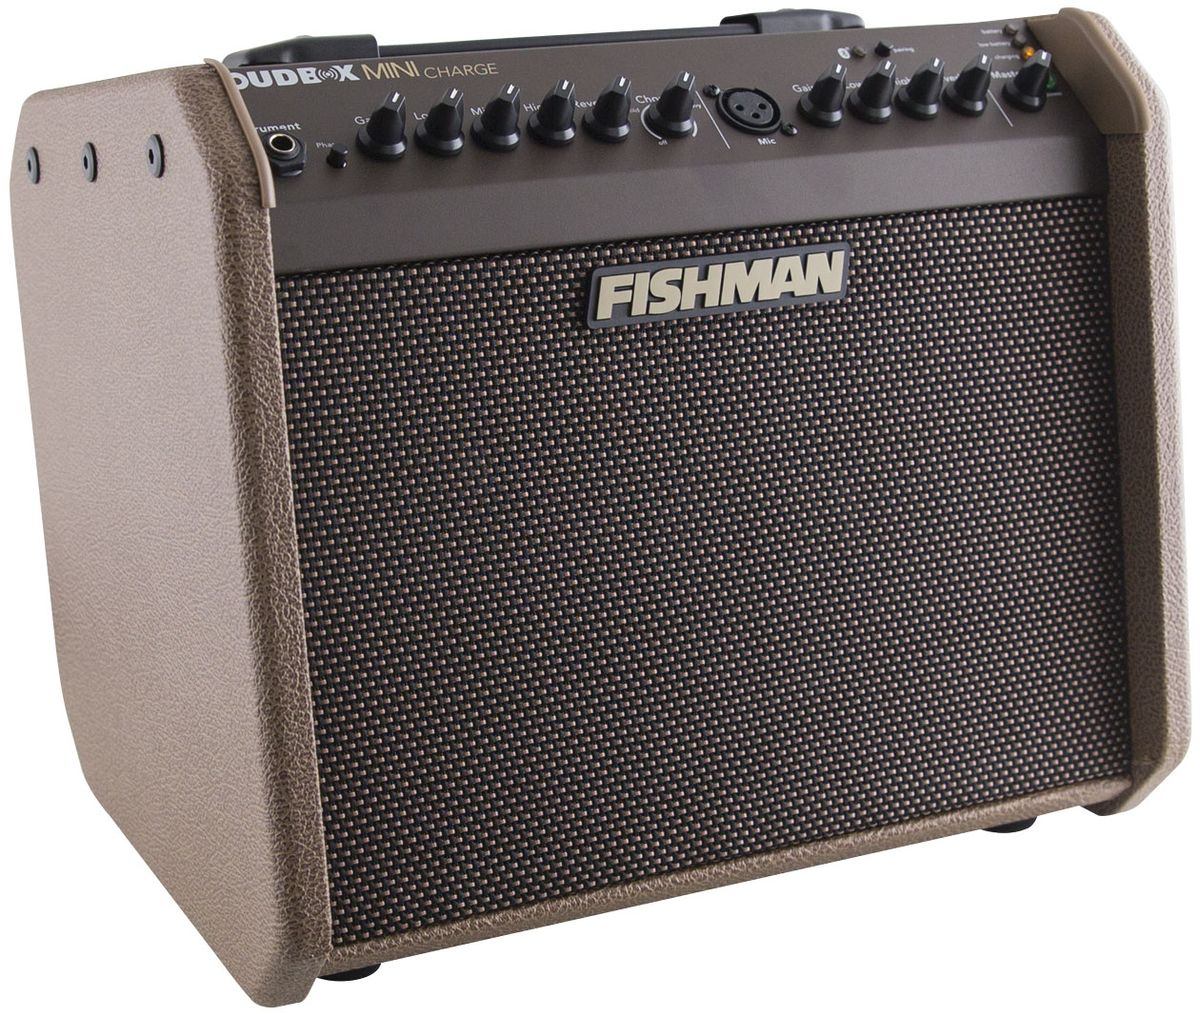 Quick Hit: Fishman Loudbox Mini Charge Review